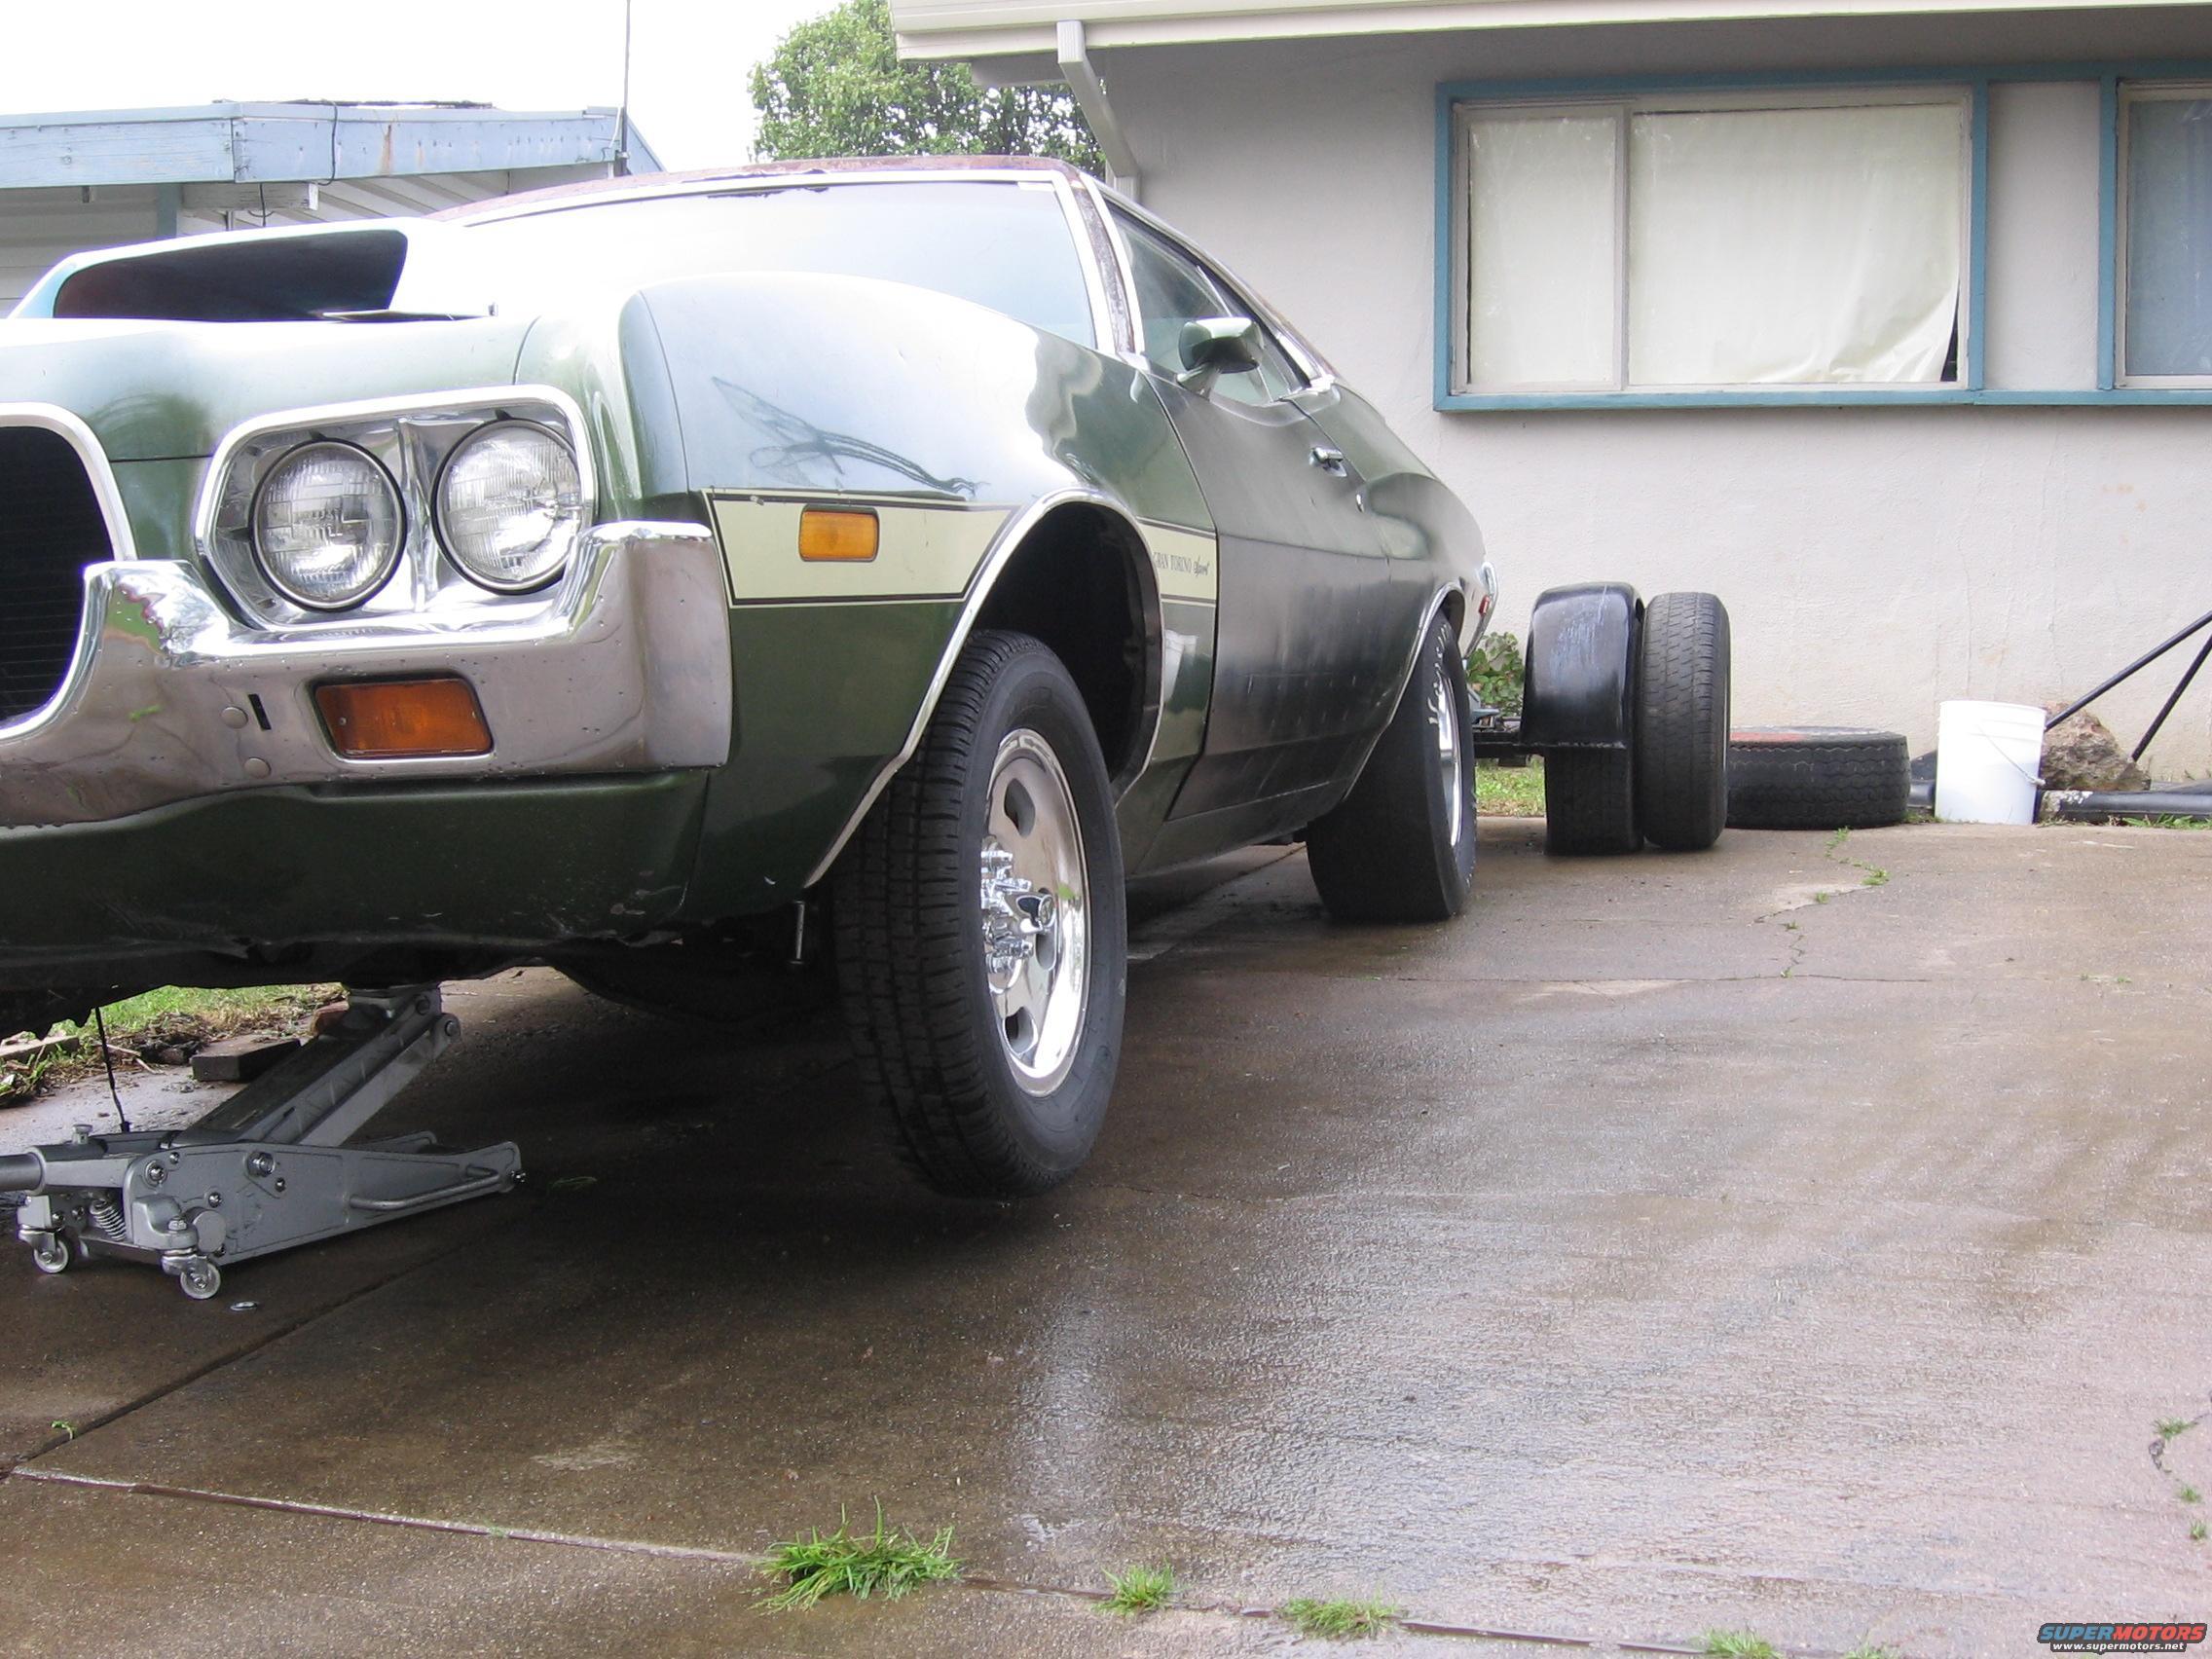 1972 Ford Ranchero sand trap picture | SuperMotors net